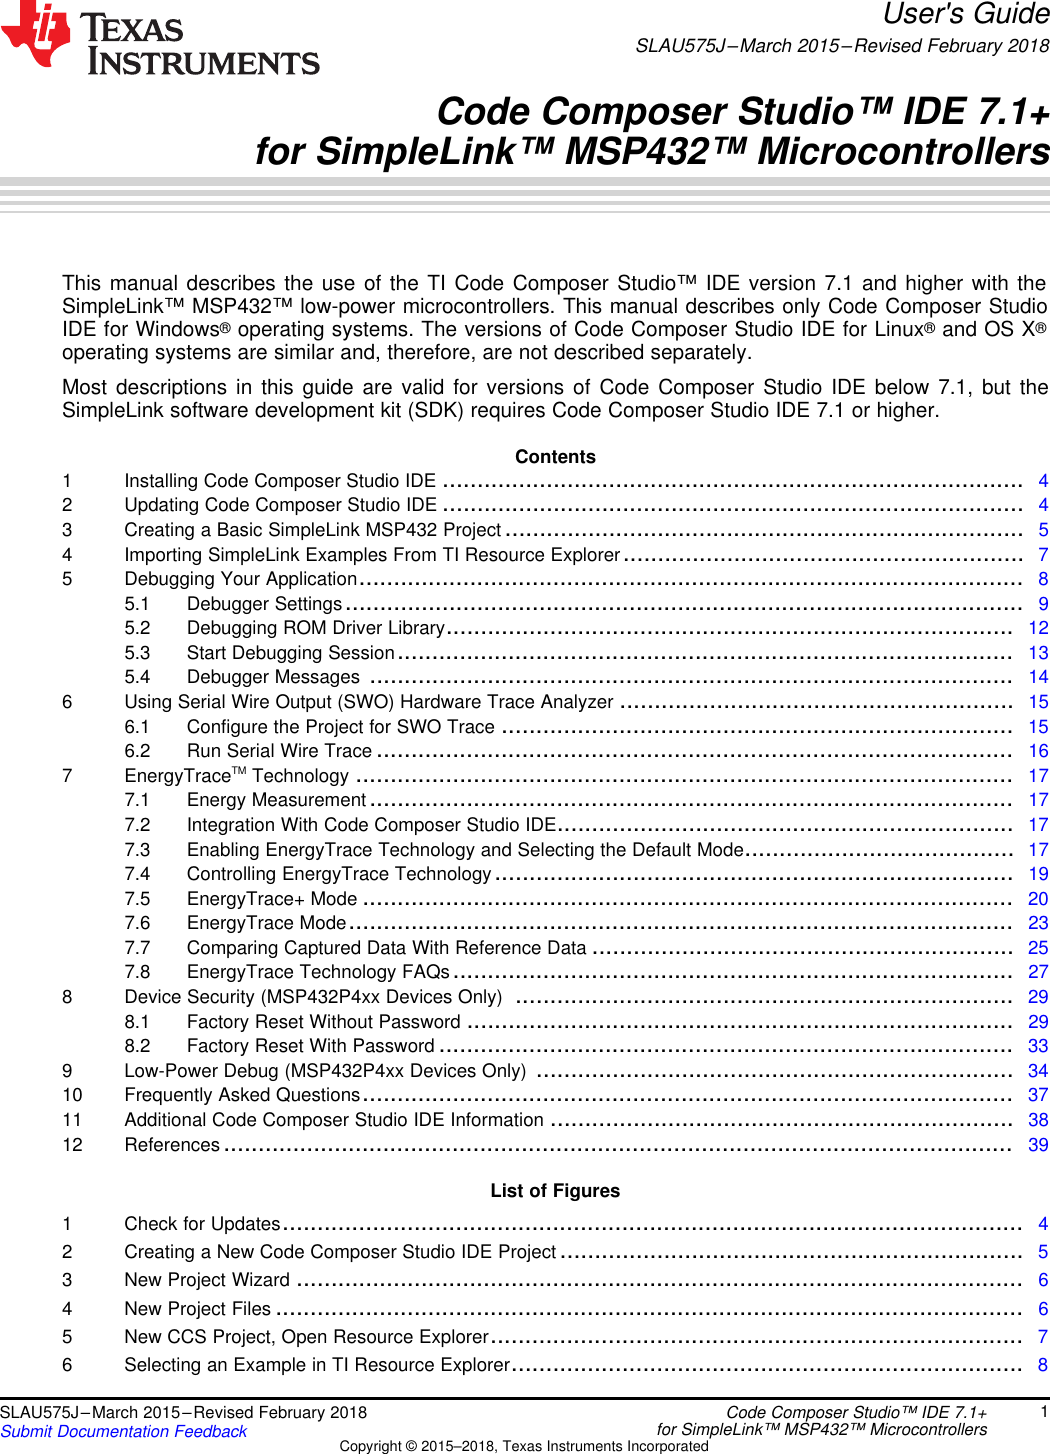 Code Composer Studio™ IDE 7 1+ For SimpleLink™ MSP432™ MCUs User's